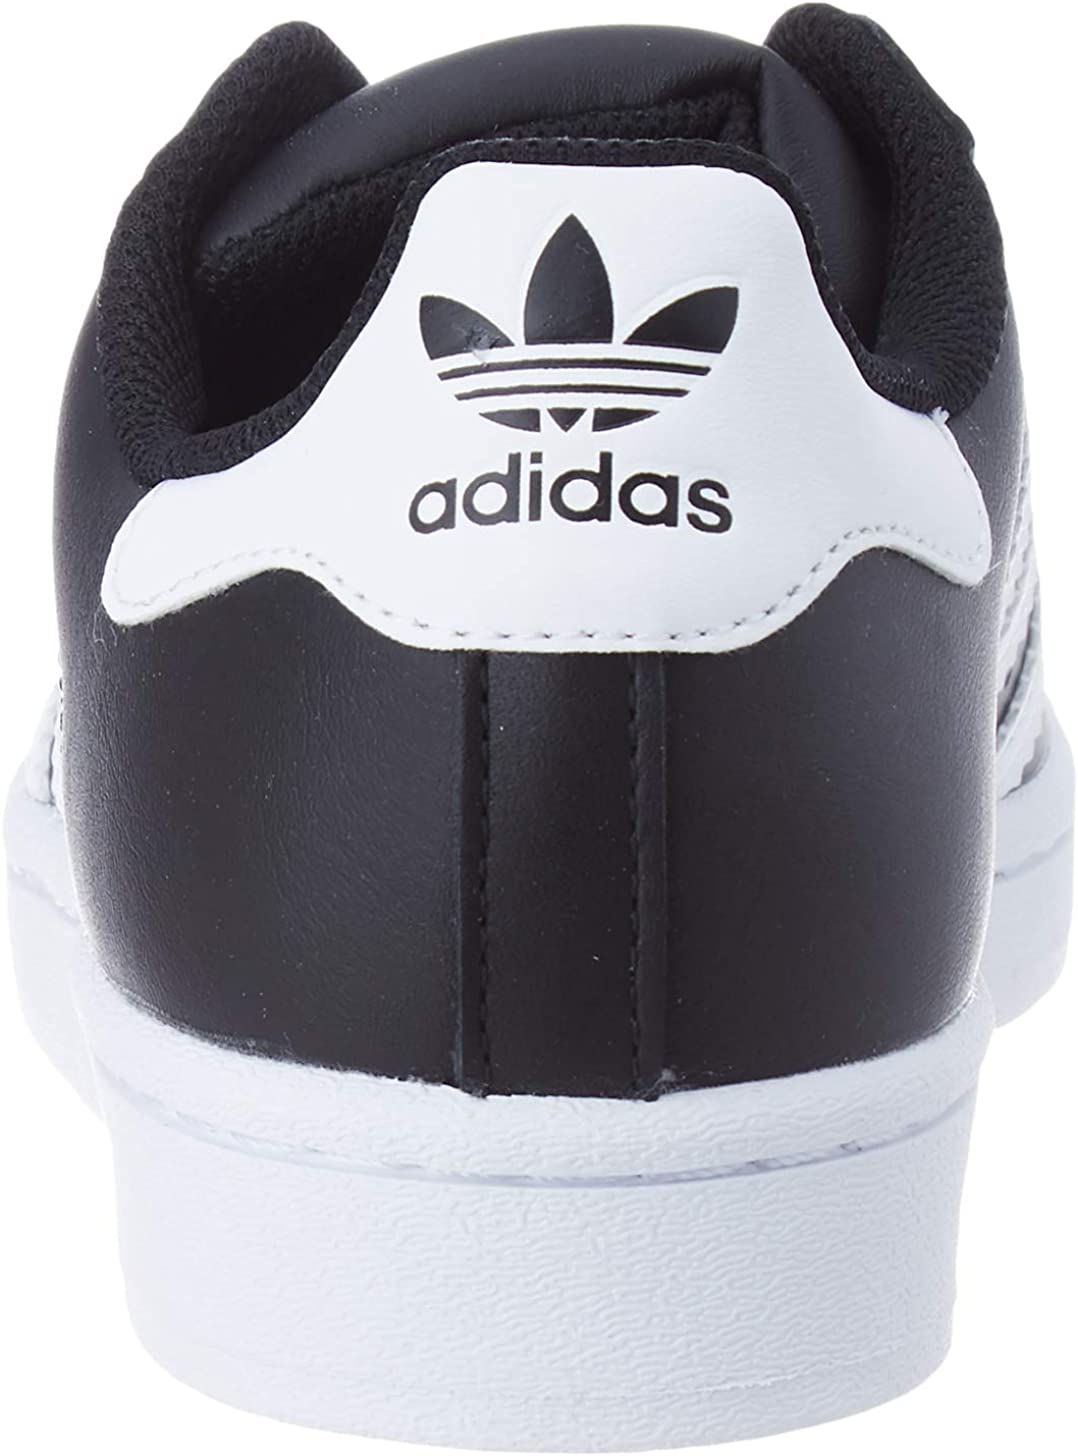 adidas Damen Superstar W Sneaker Core Black Ftwr White Core Black